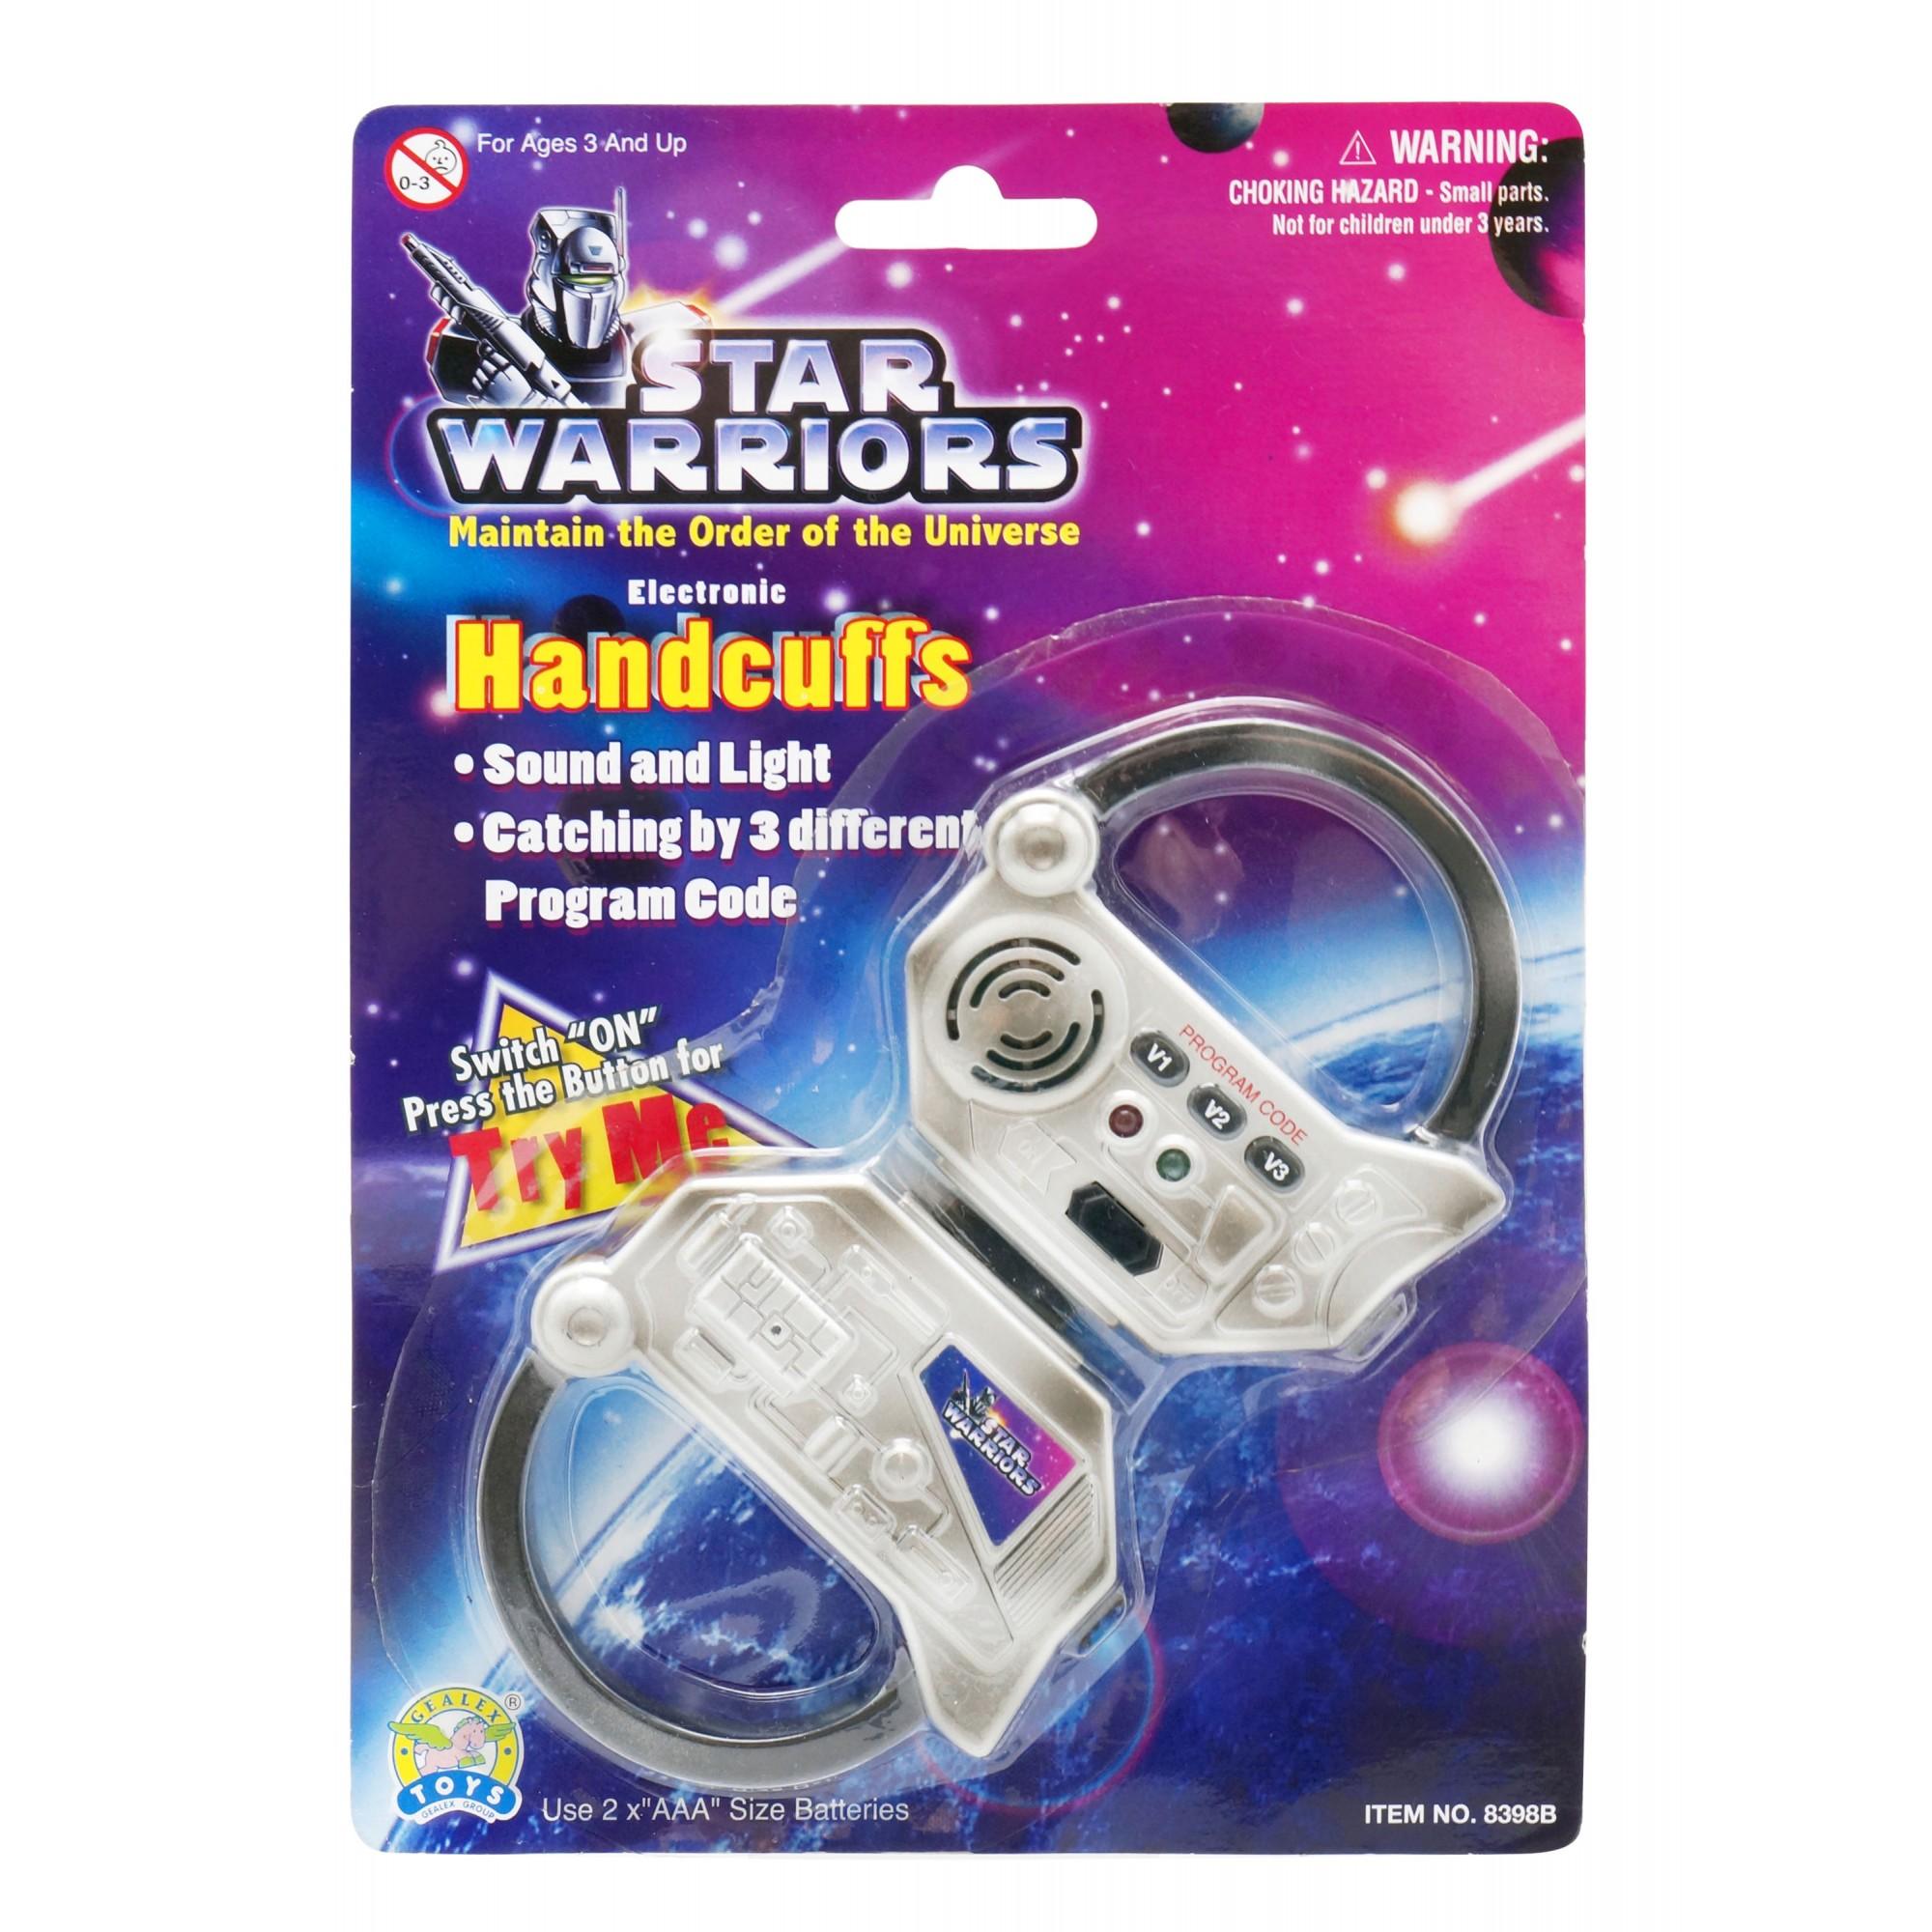 Star Warriors Hand-Cuff